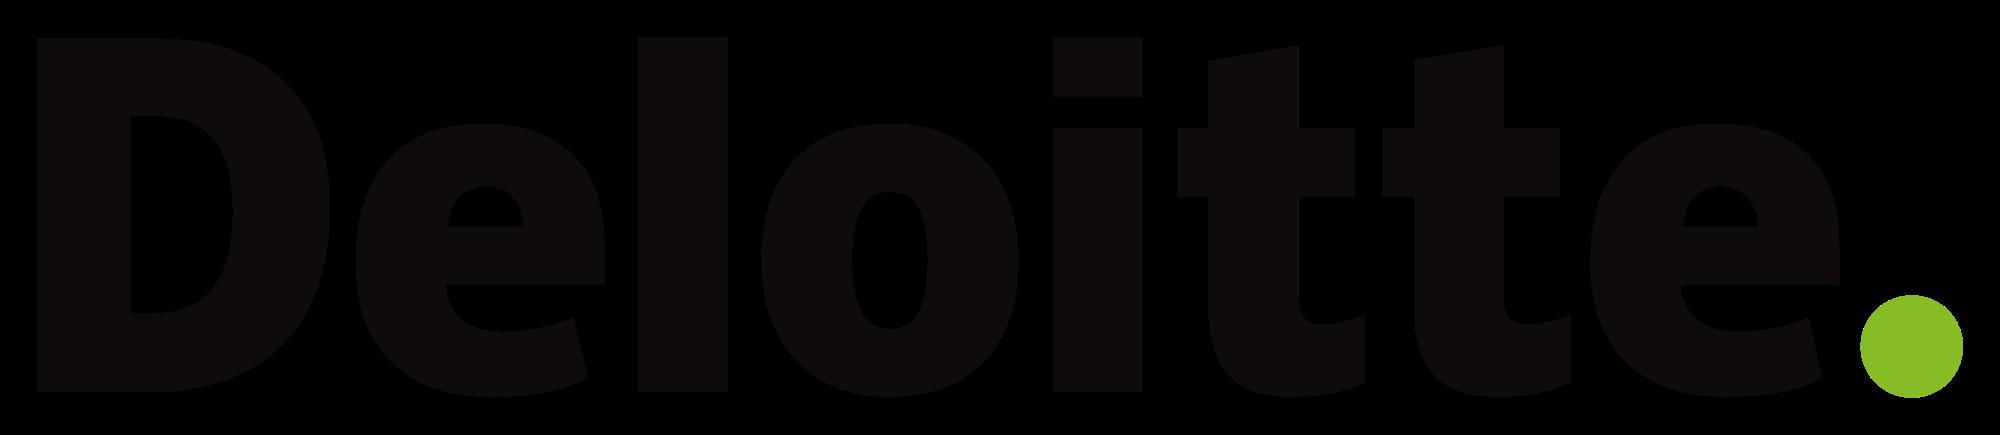 2000px-Deloitte.svg